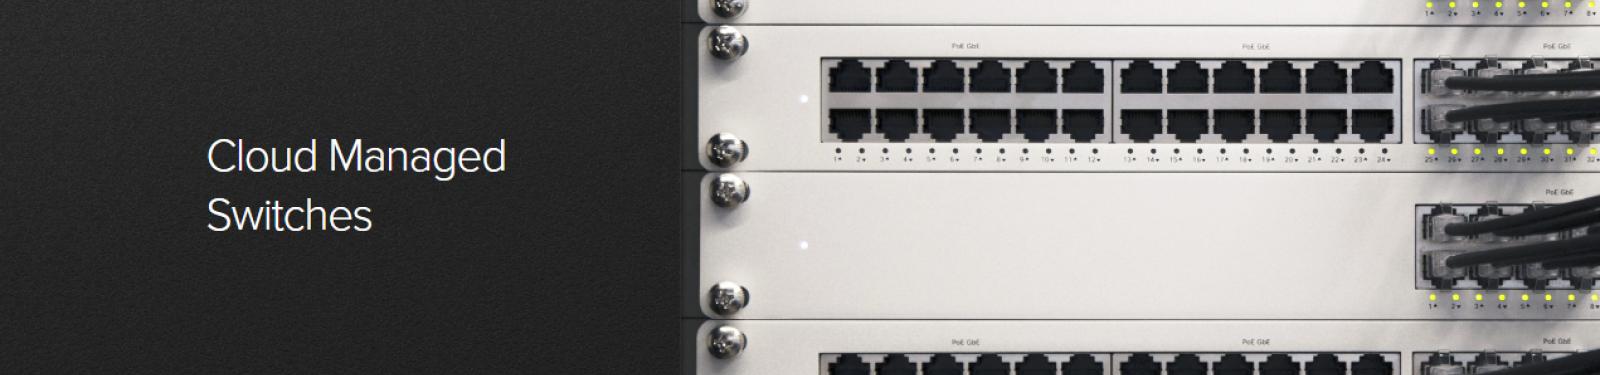 Cisco meraki wireless dubai